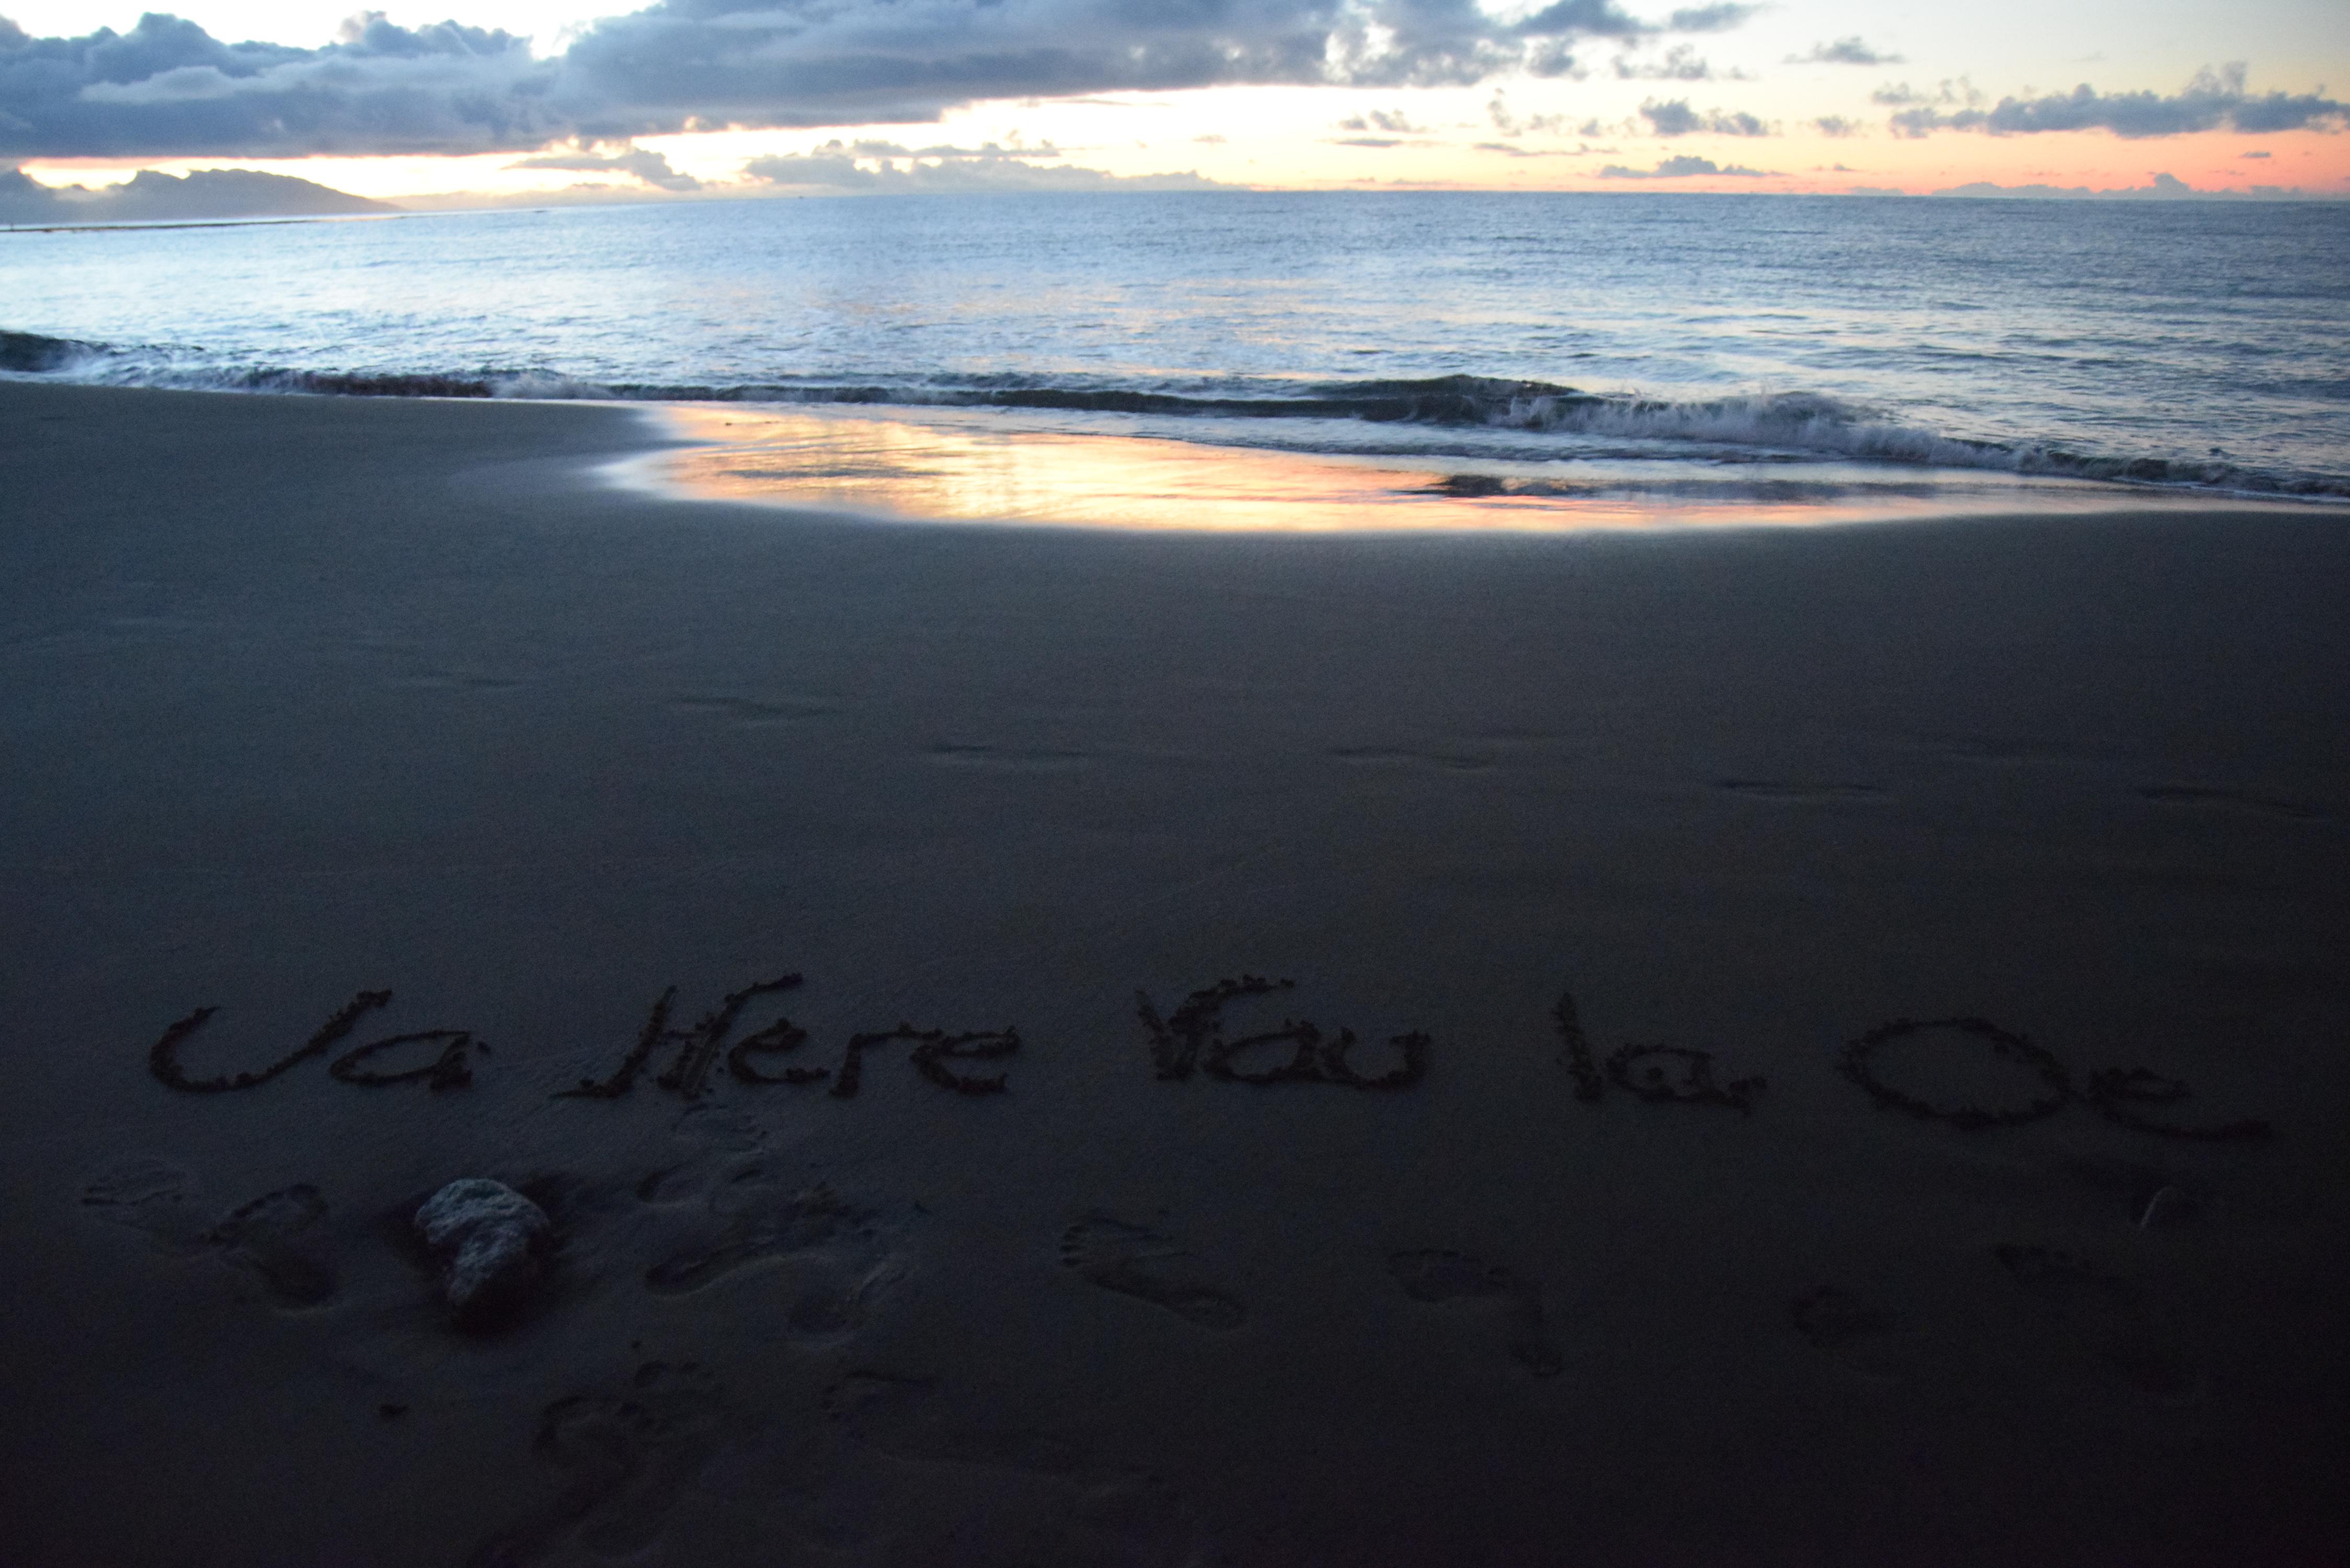 (I love you)